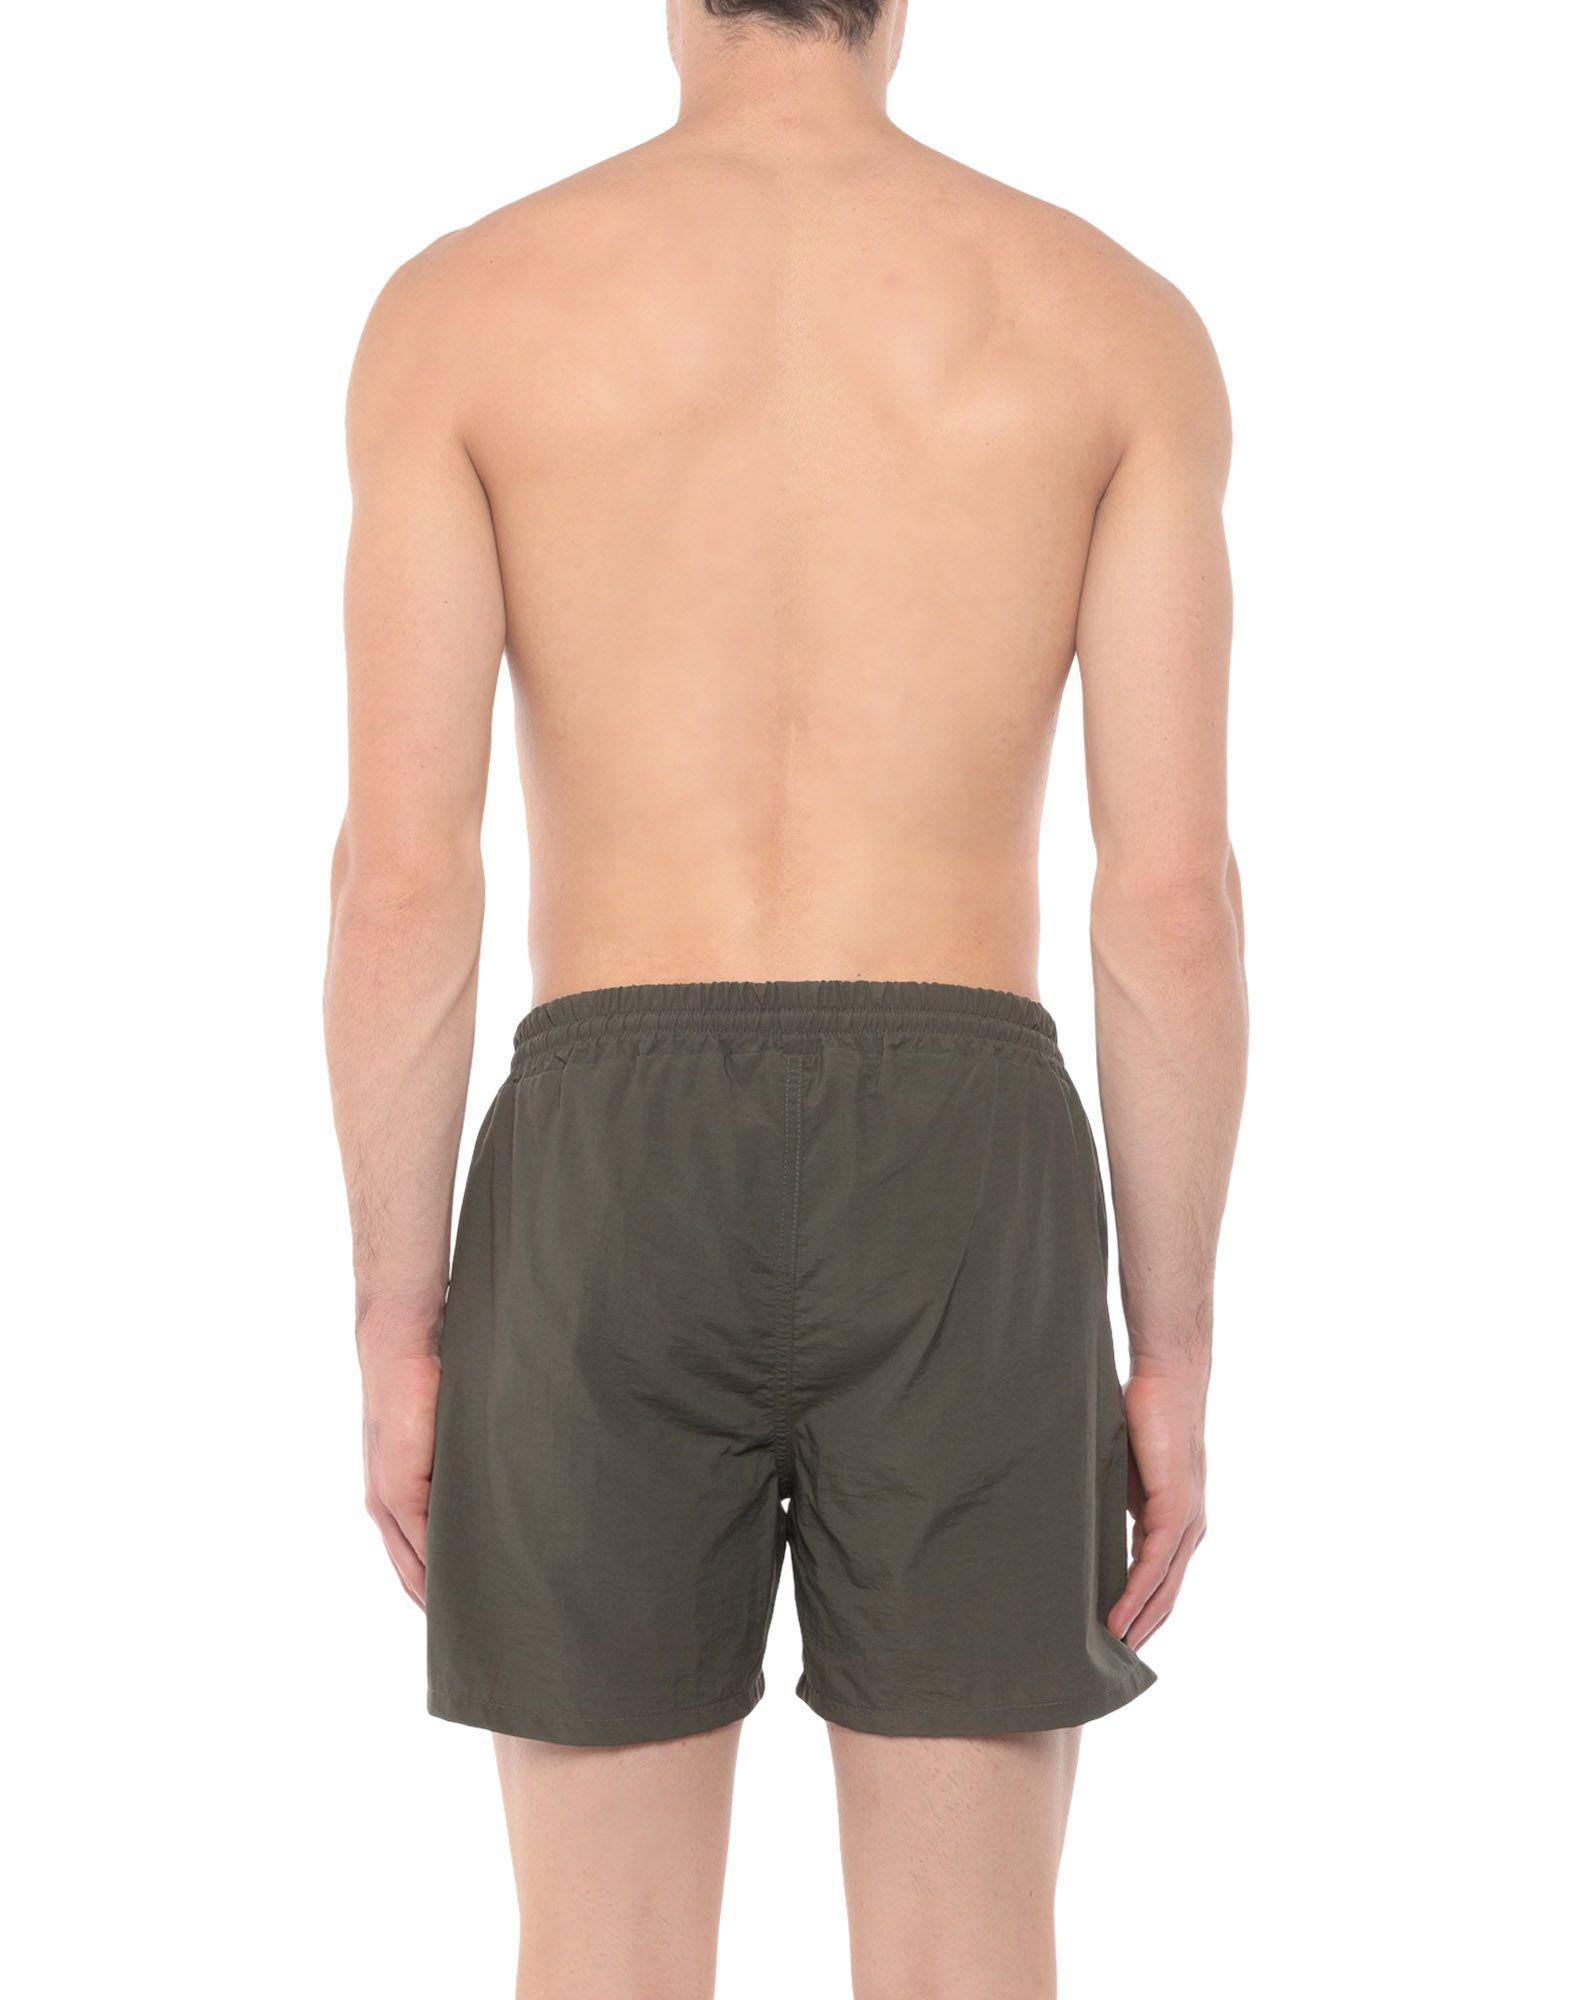 7461ad3d39 Lyst - Mcq Alexander Mcqueen Swimming Trunks in Green for Men